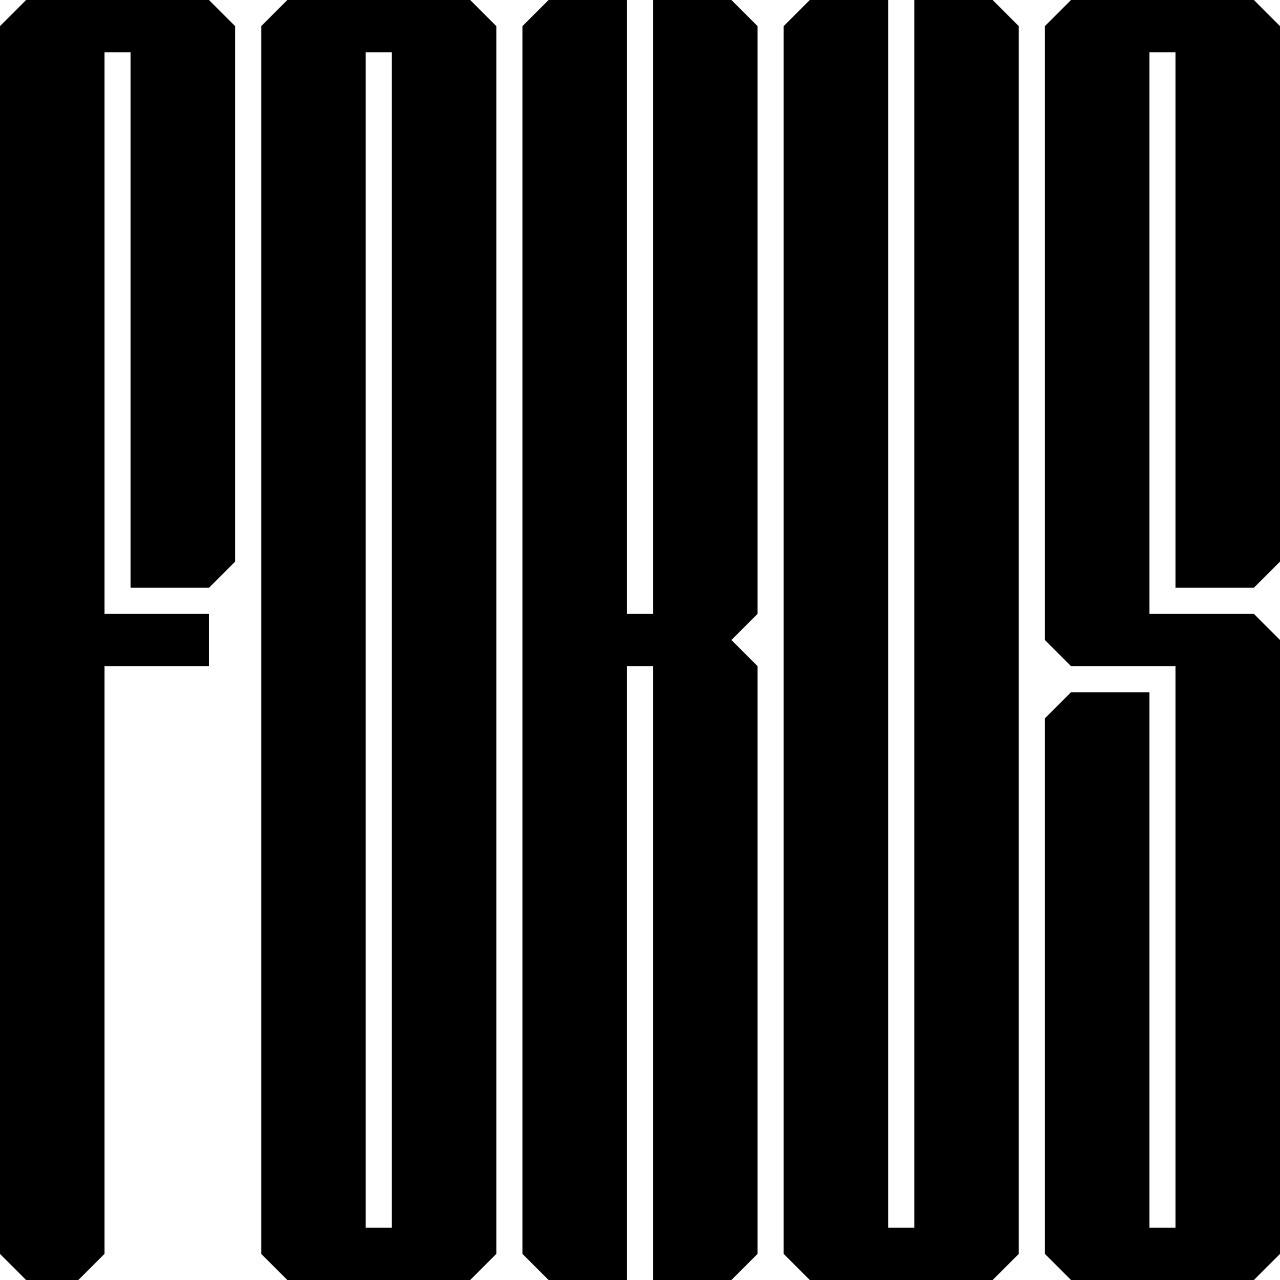 FOKUS (2017 - typography - niclasresch | ello